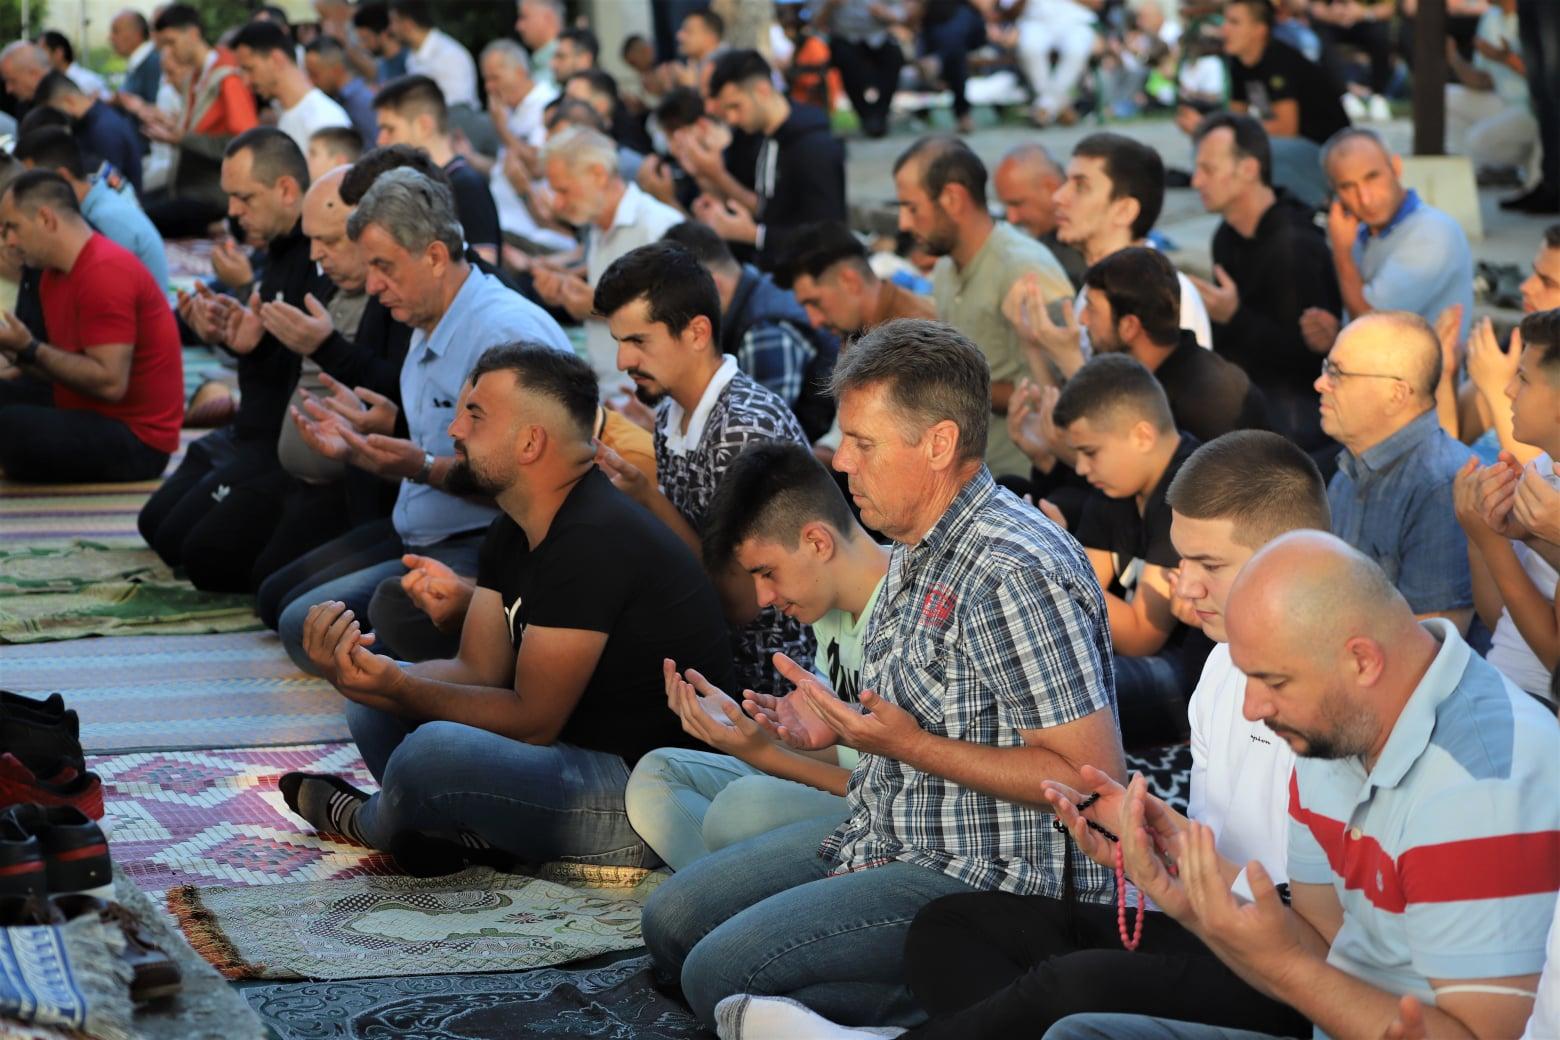 Kuzey Makedonya'da Kurban Bayramı coşkusu